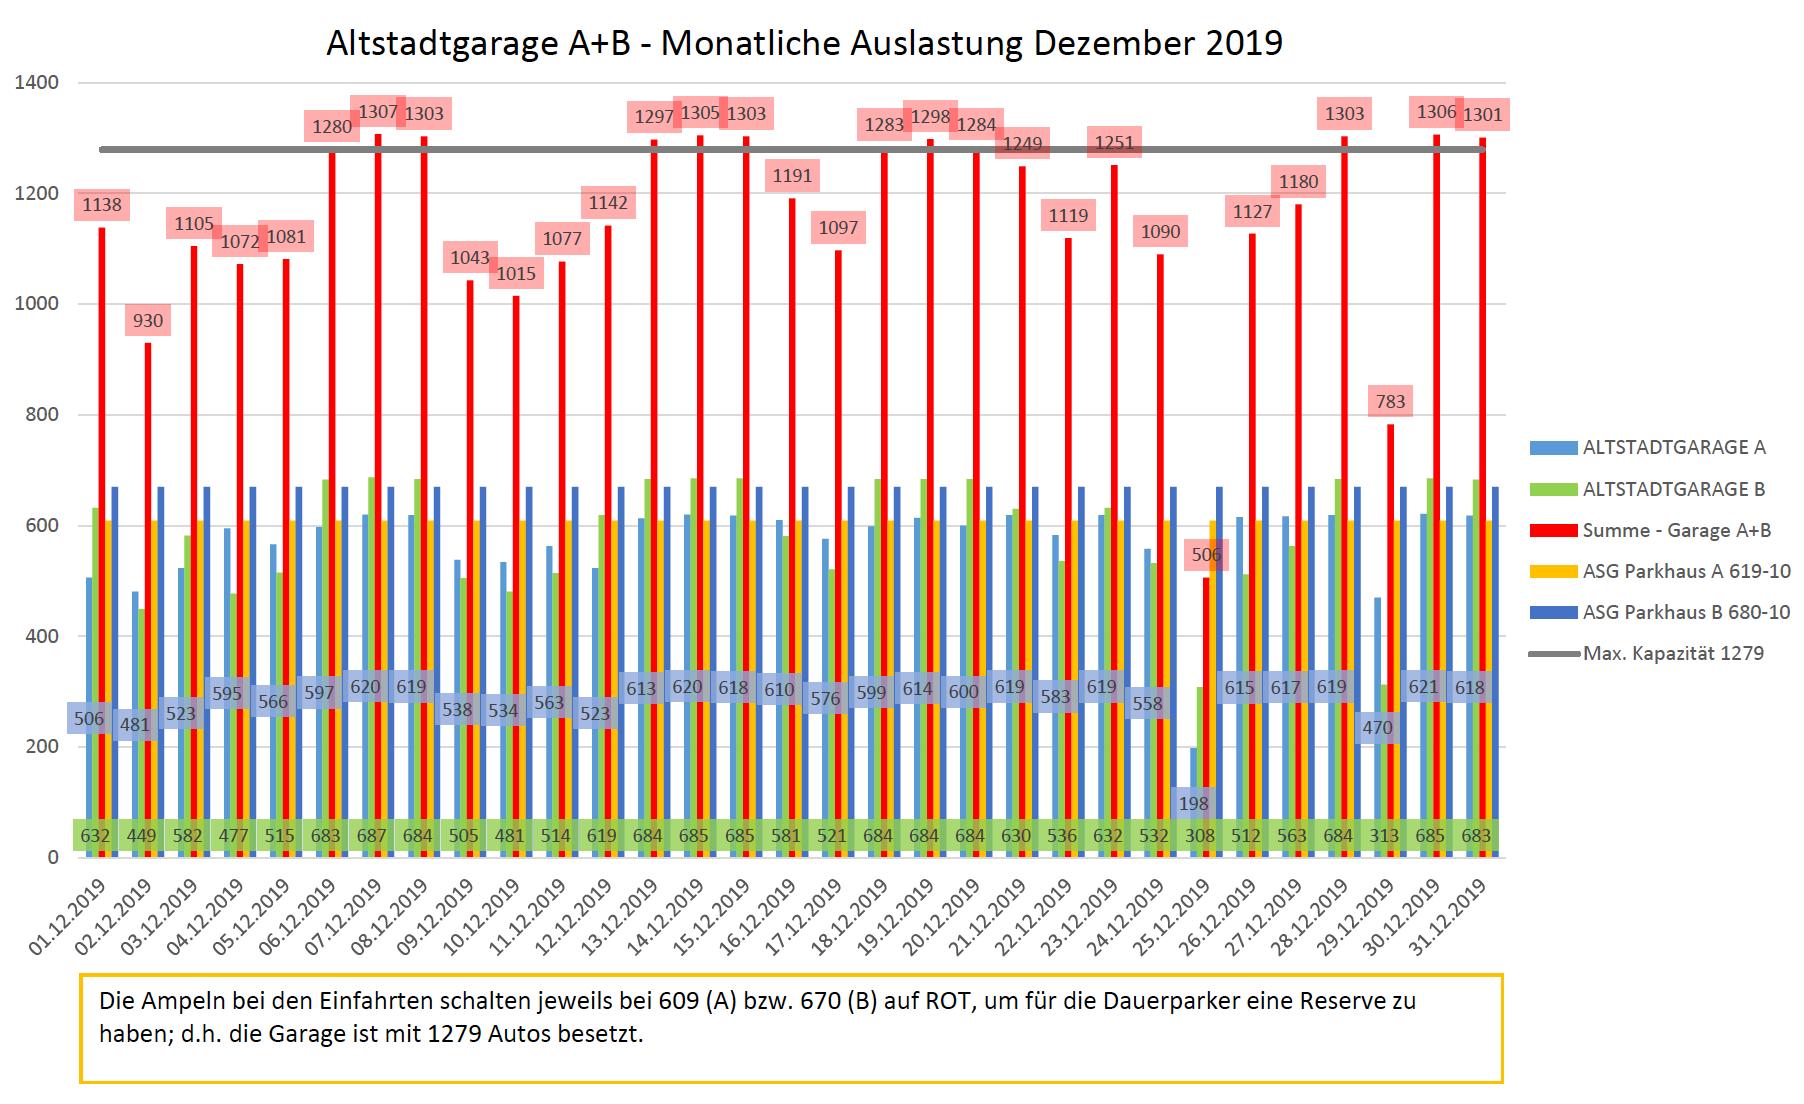 Auslastungszahlen Dezember 2019